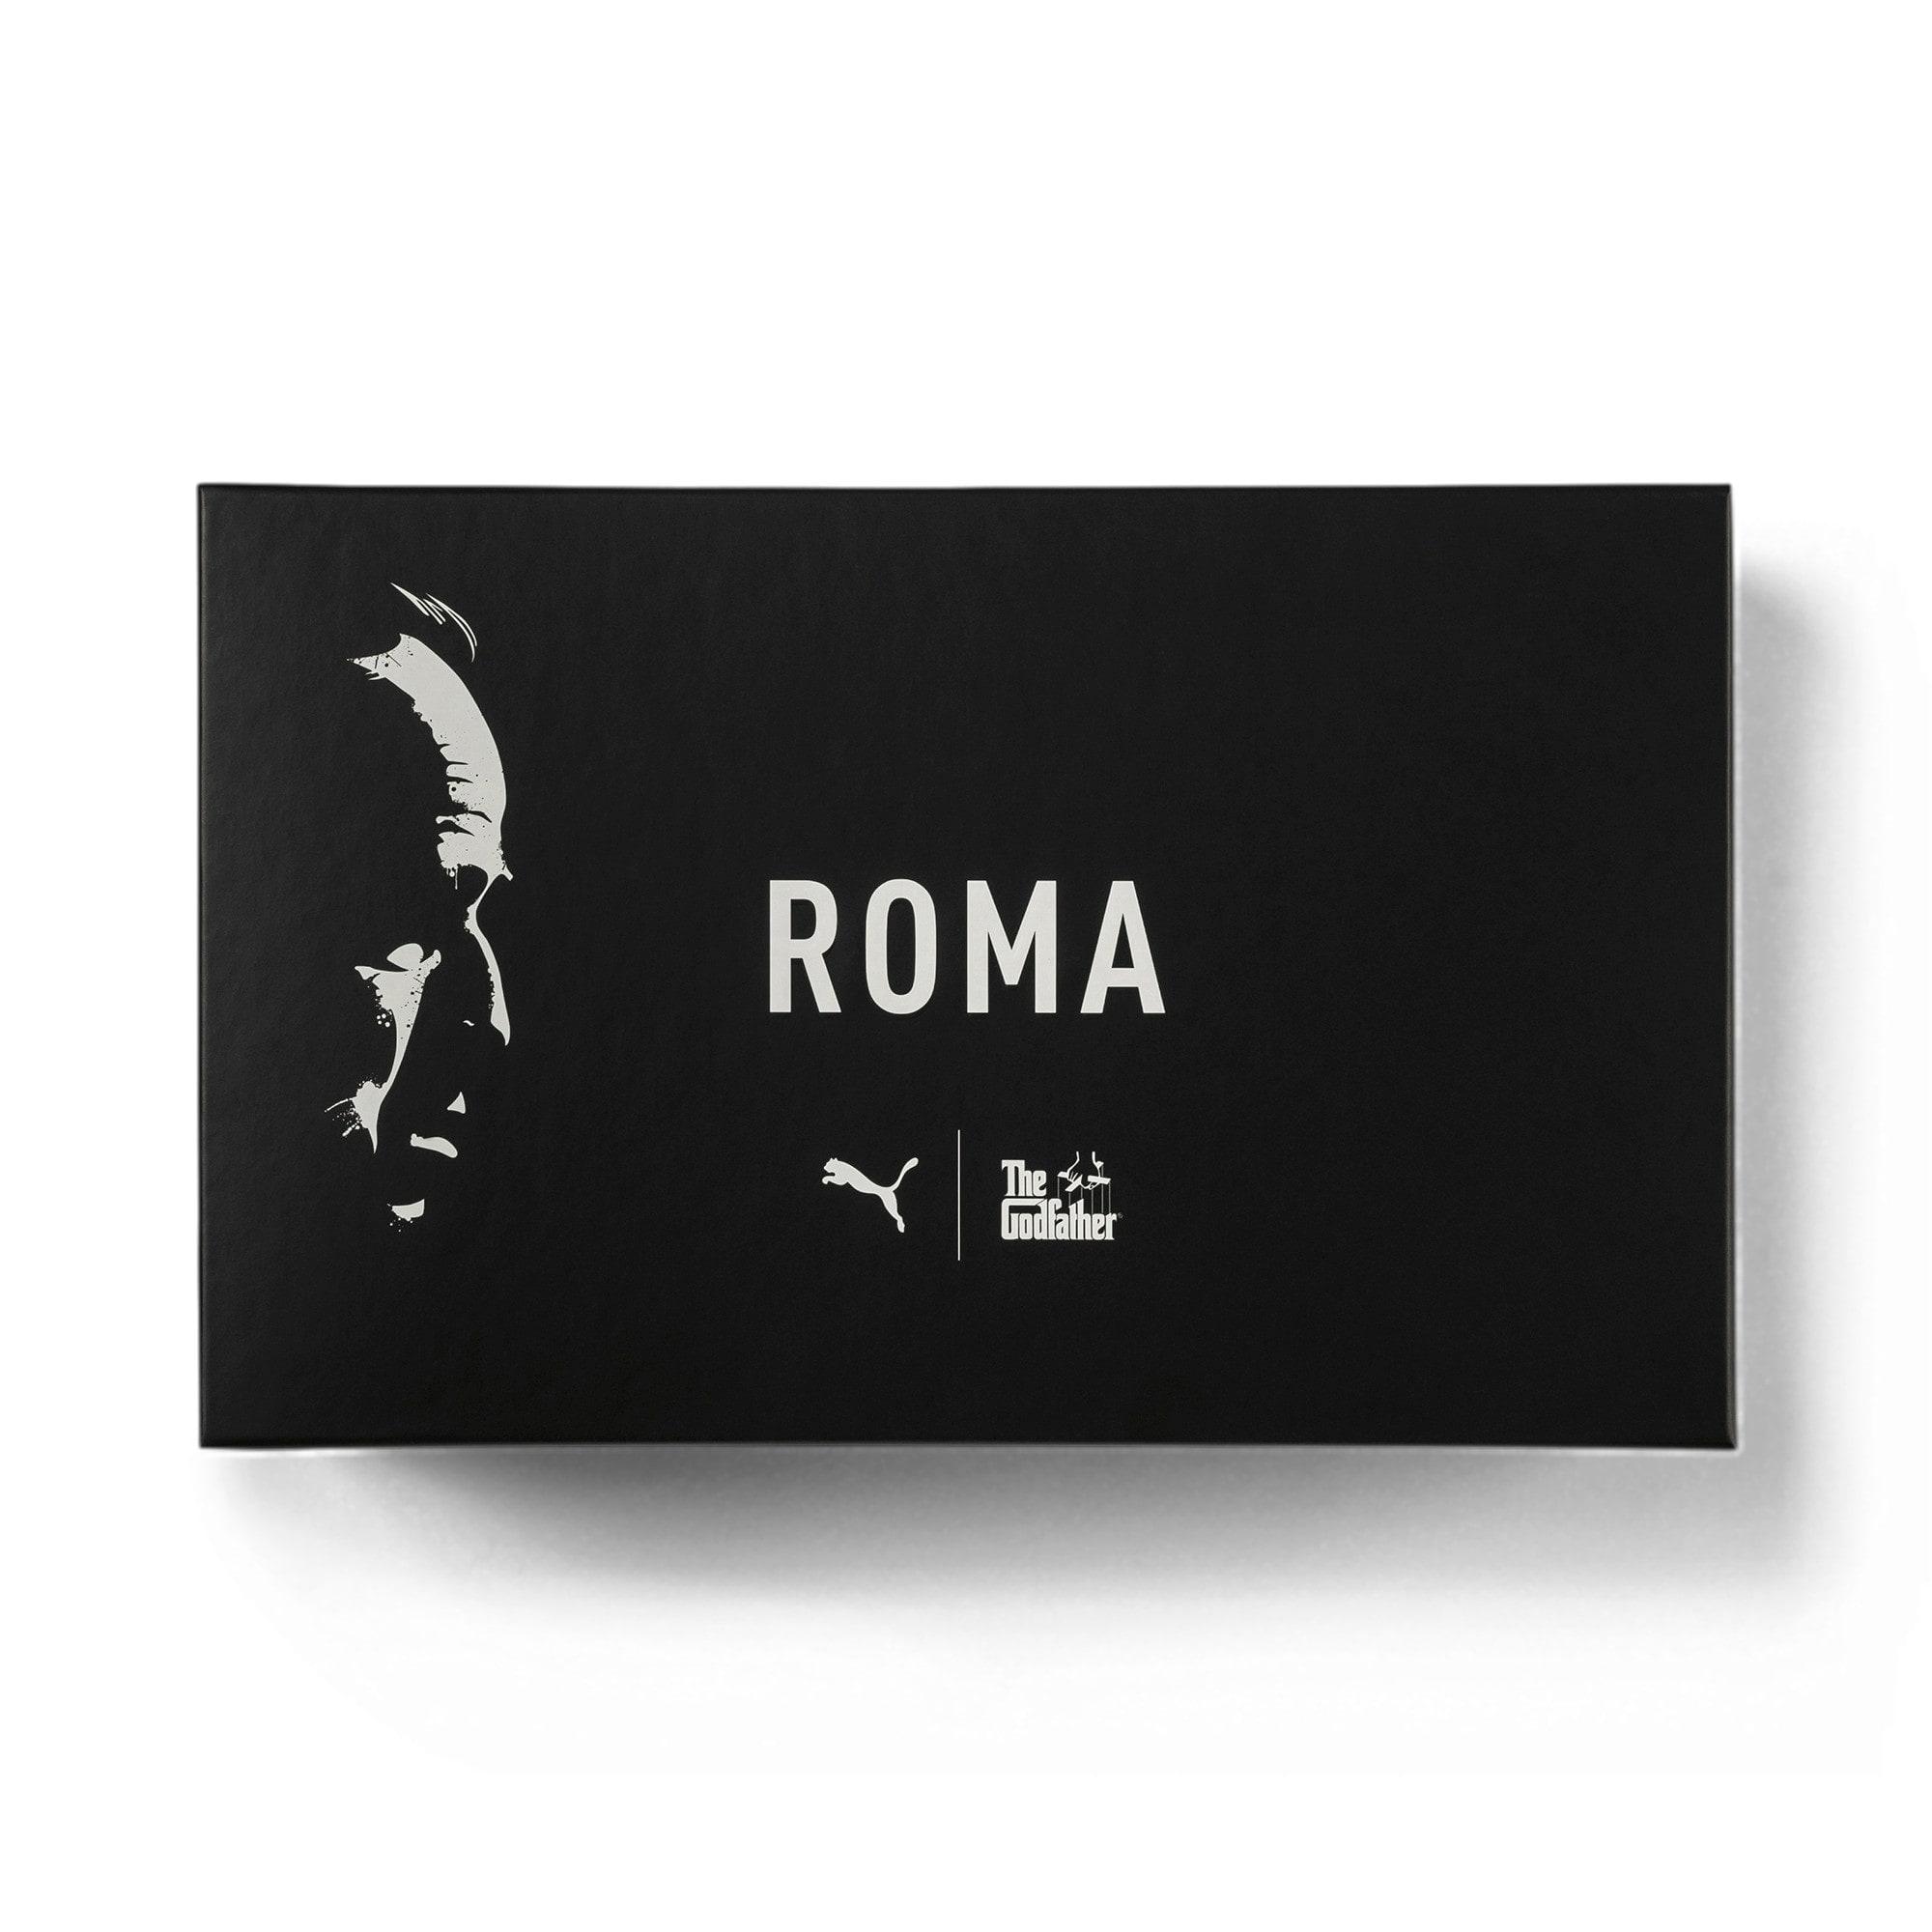 Thumbnail 8 of PUMA x THE GODFATHER Roma Woltz Sneakers, WINDCHIME-Puma Black, medium